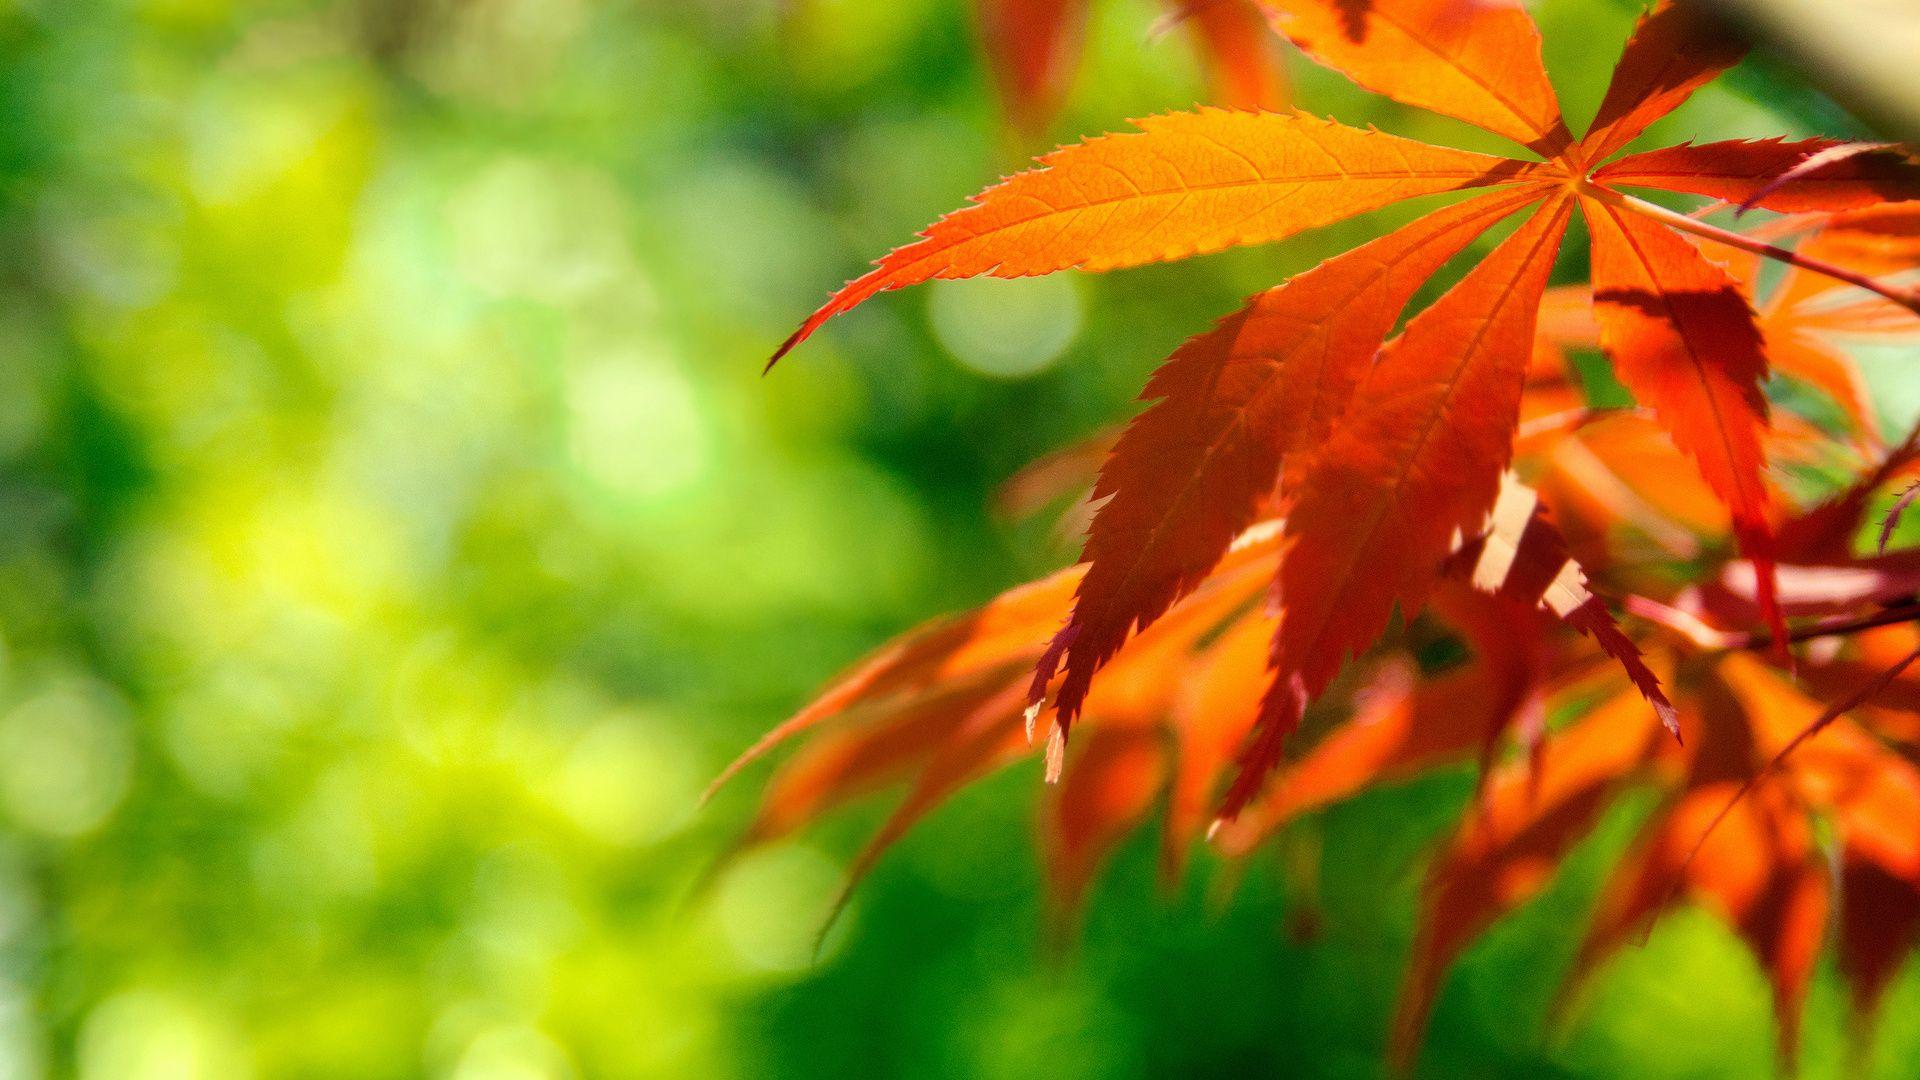 Foliage Cool HD Wallpaper